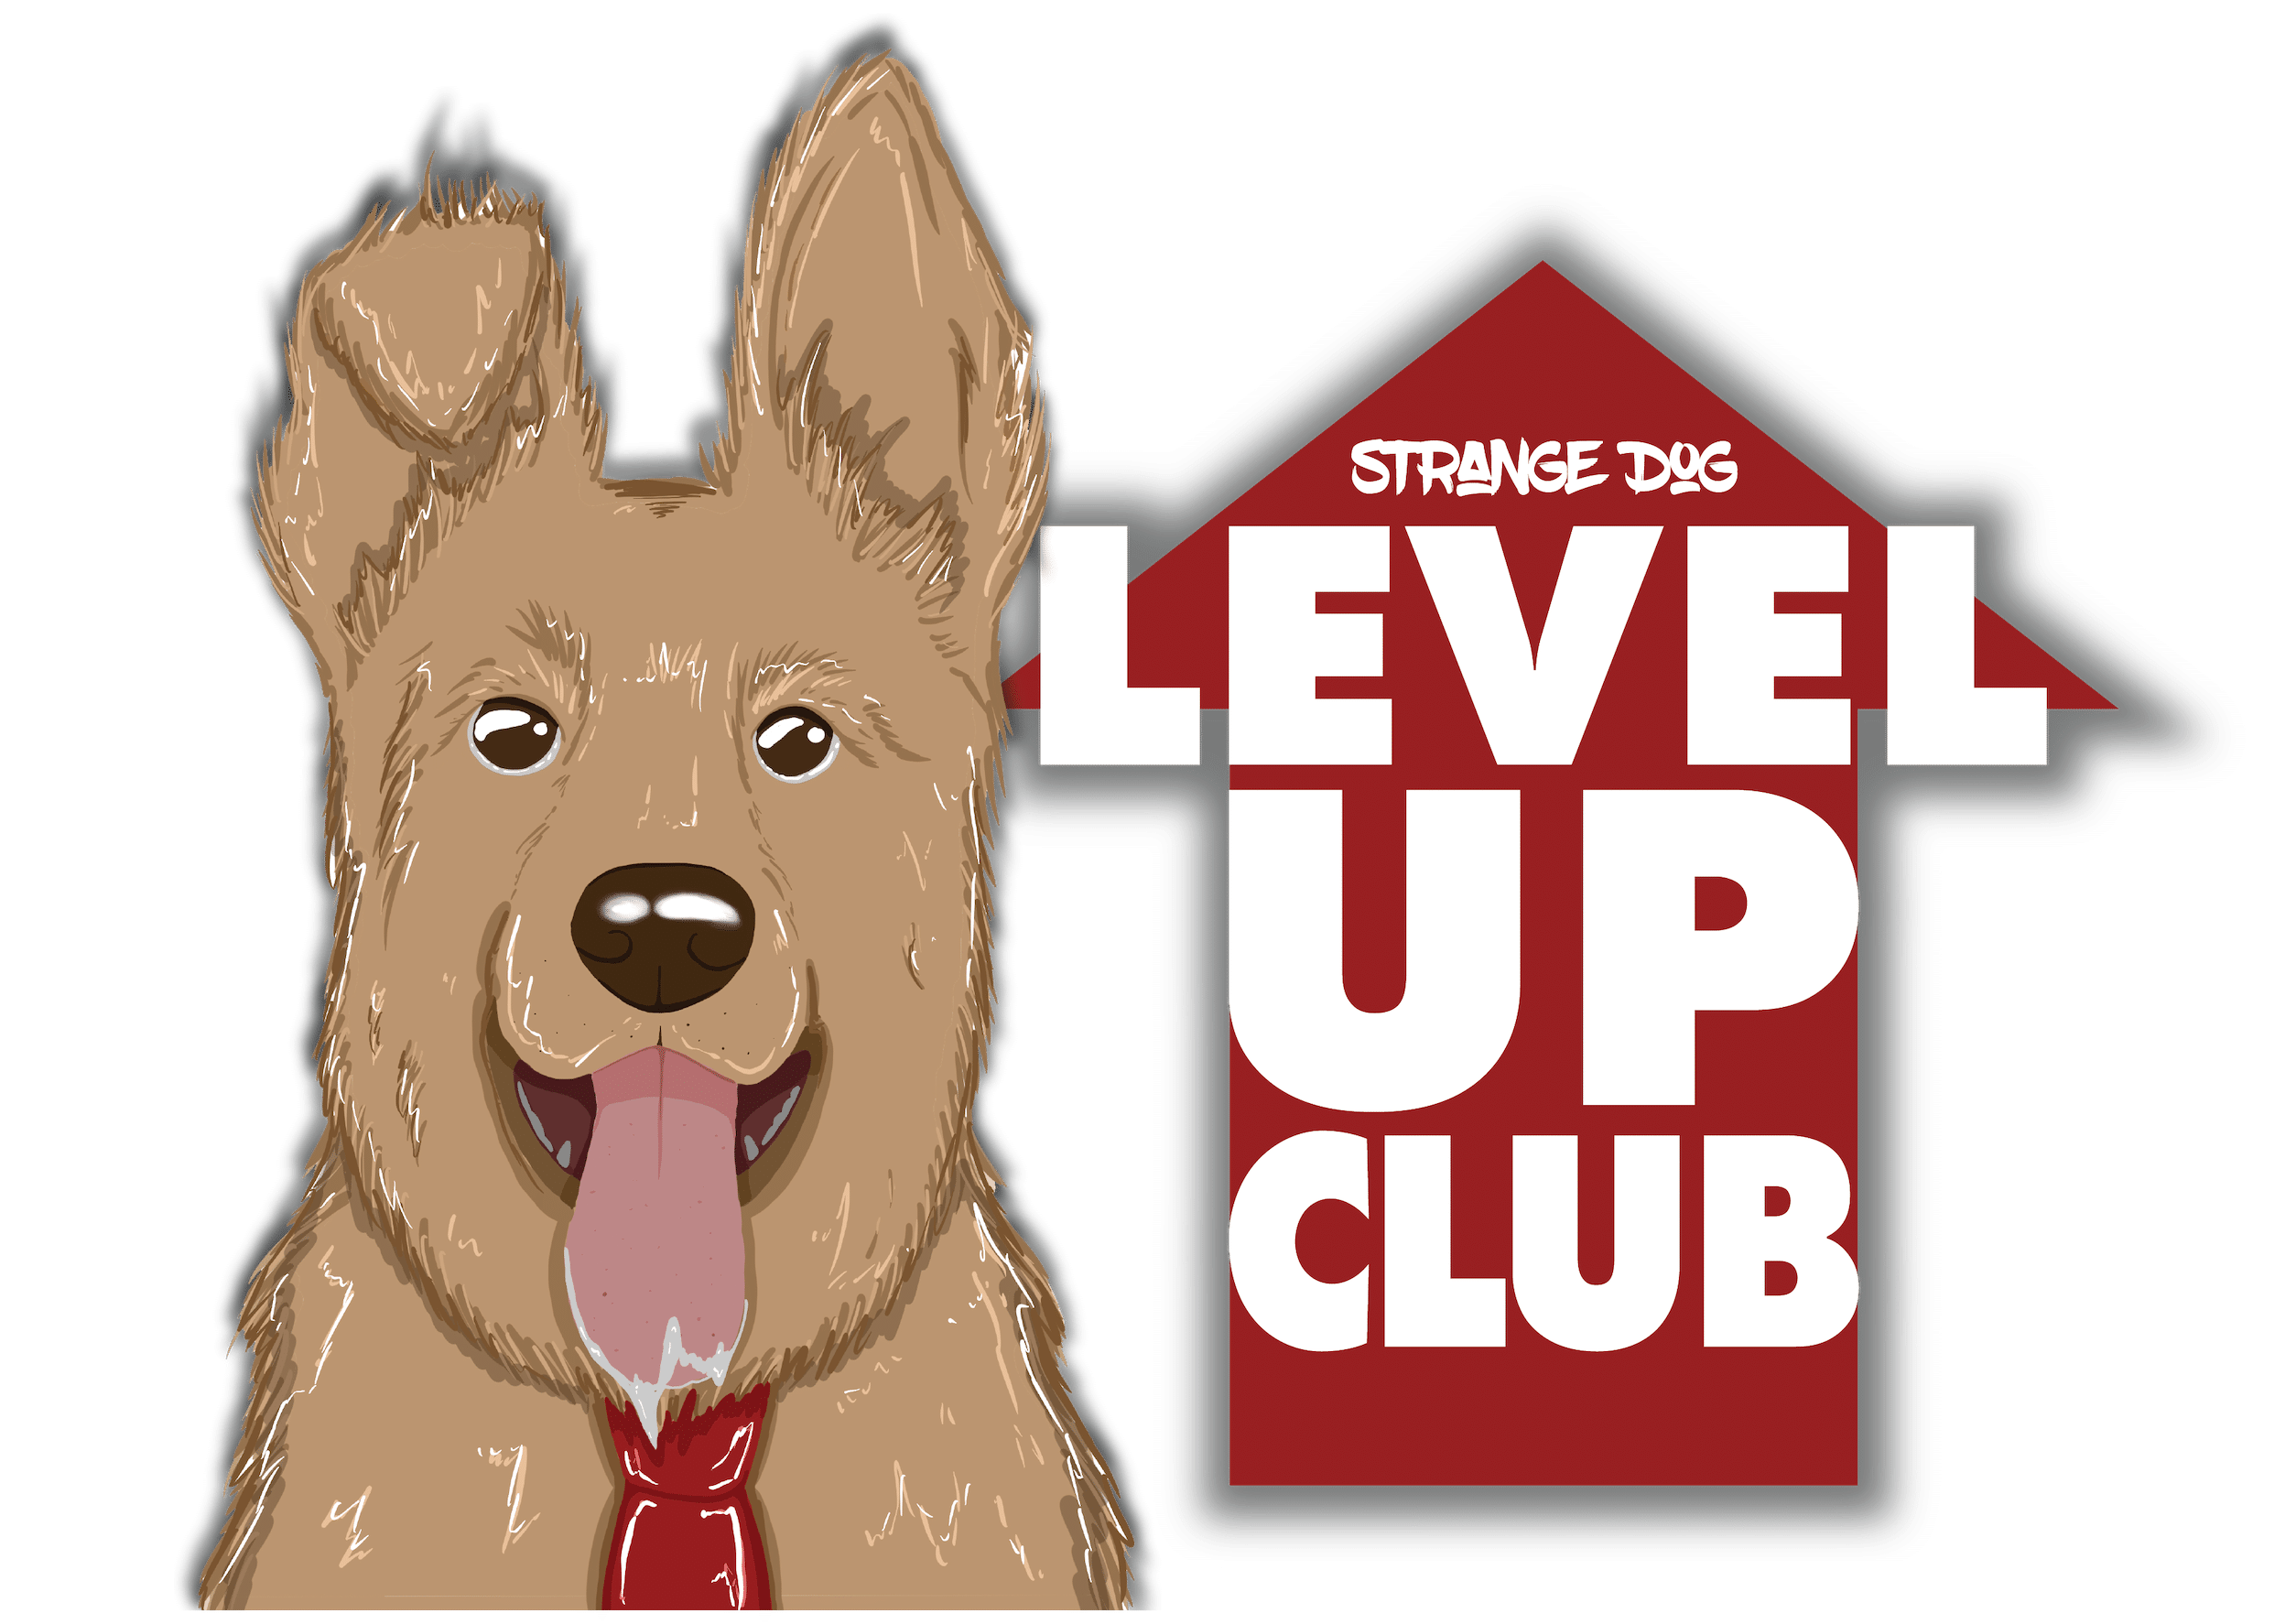 Strange Dog VIP